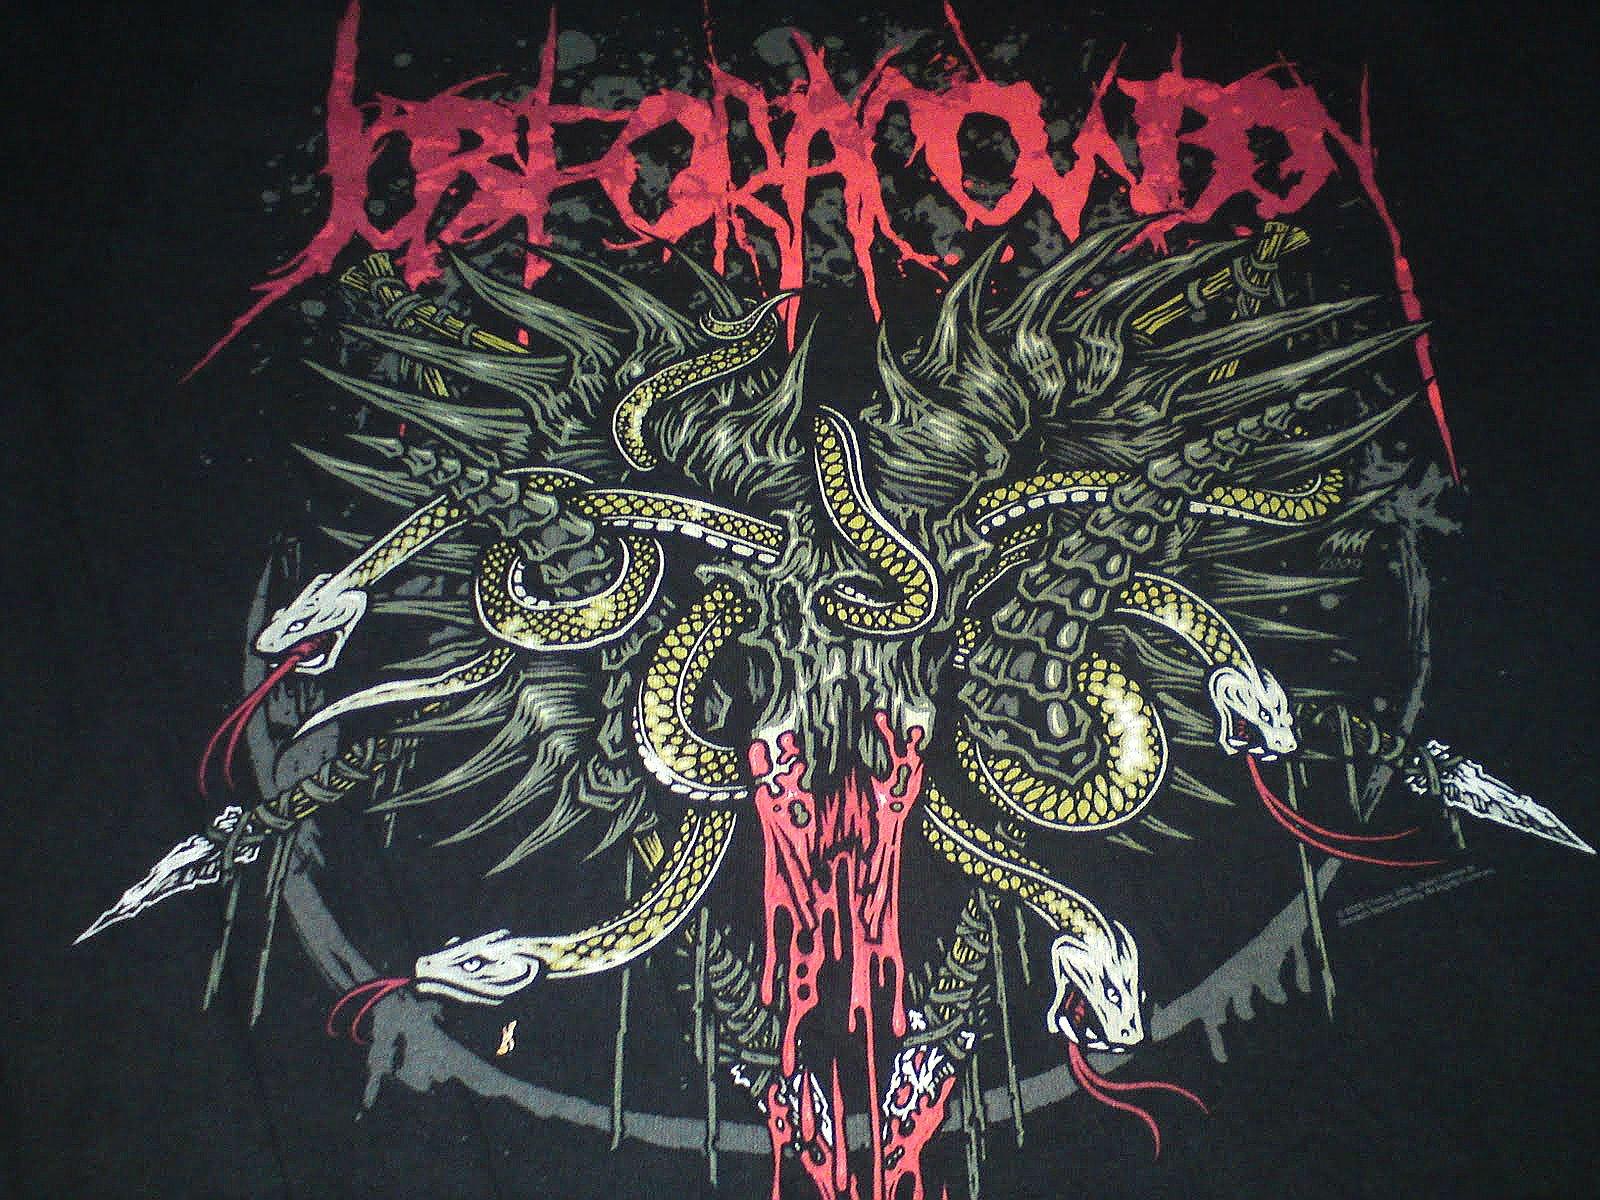 1600x1200 px 1jfac a cowboy dark death deathcore demon evil for heavy job metal occult satan